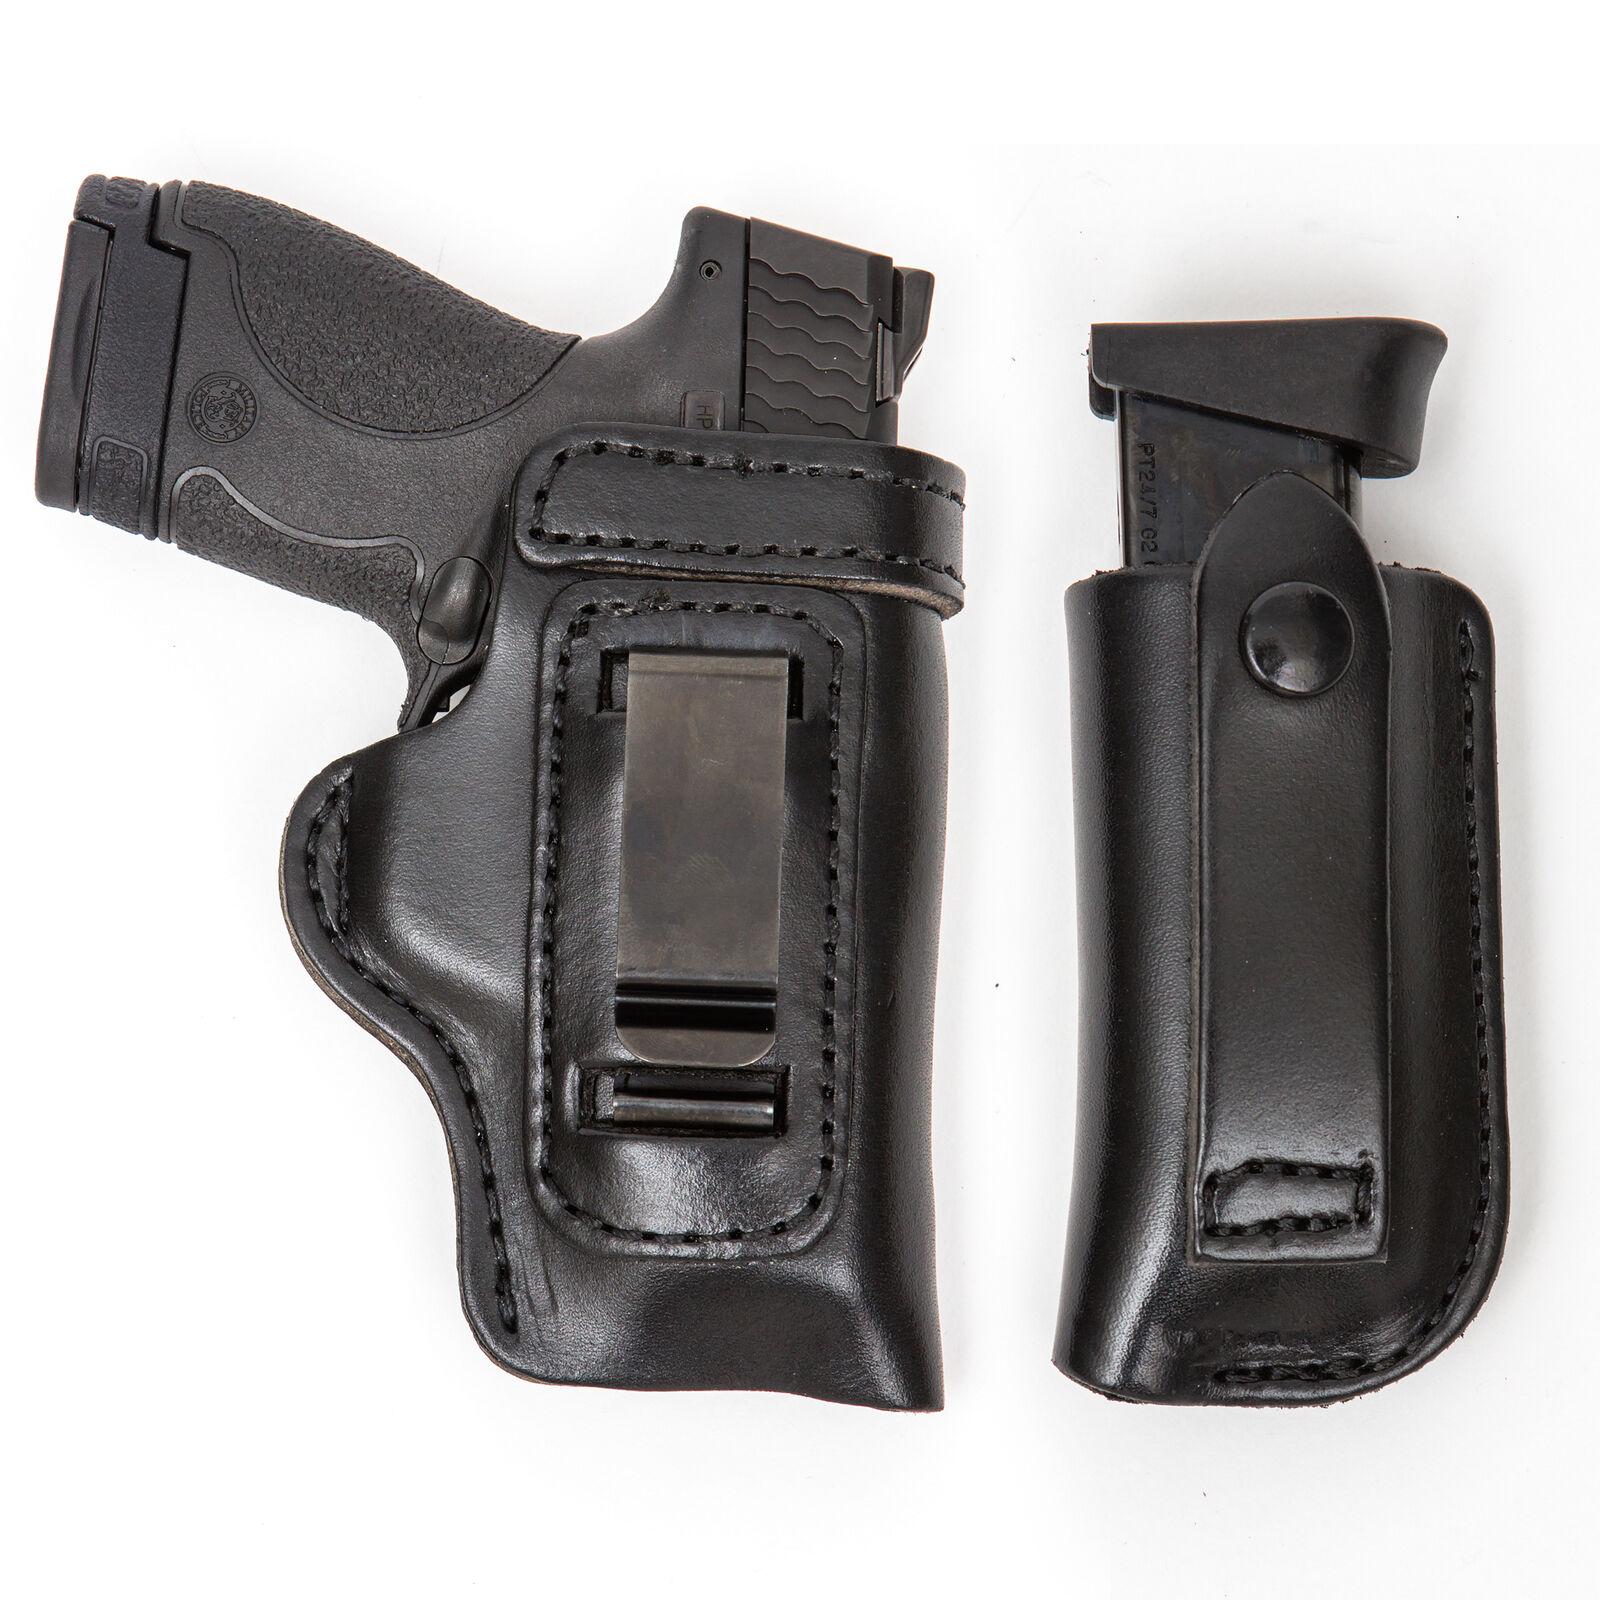 Combo Pack IWB owb RH LH Funda Pistola & Mag Para Taurus 805